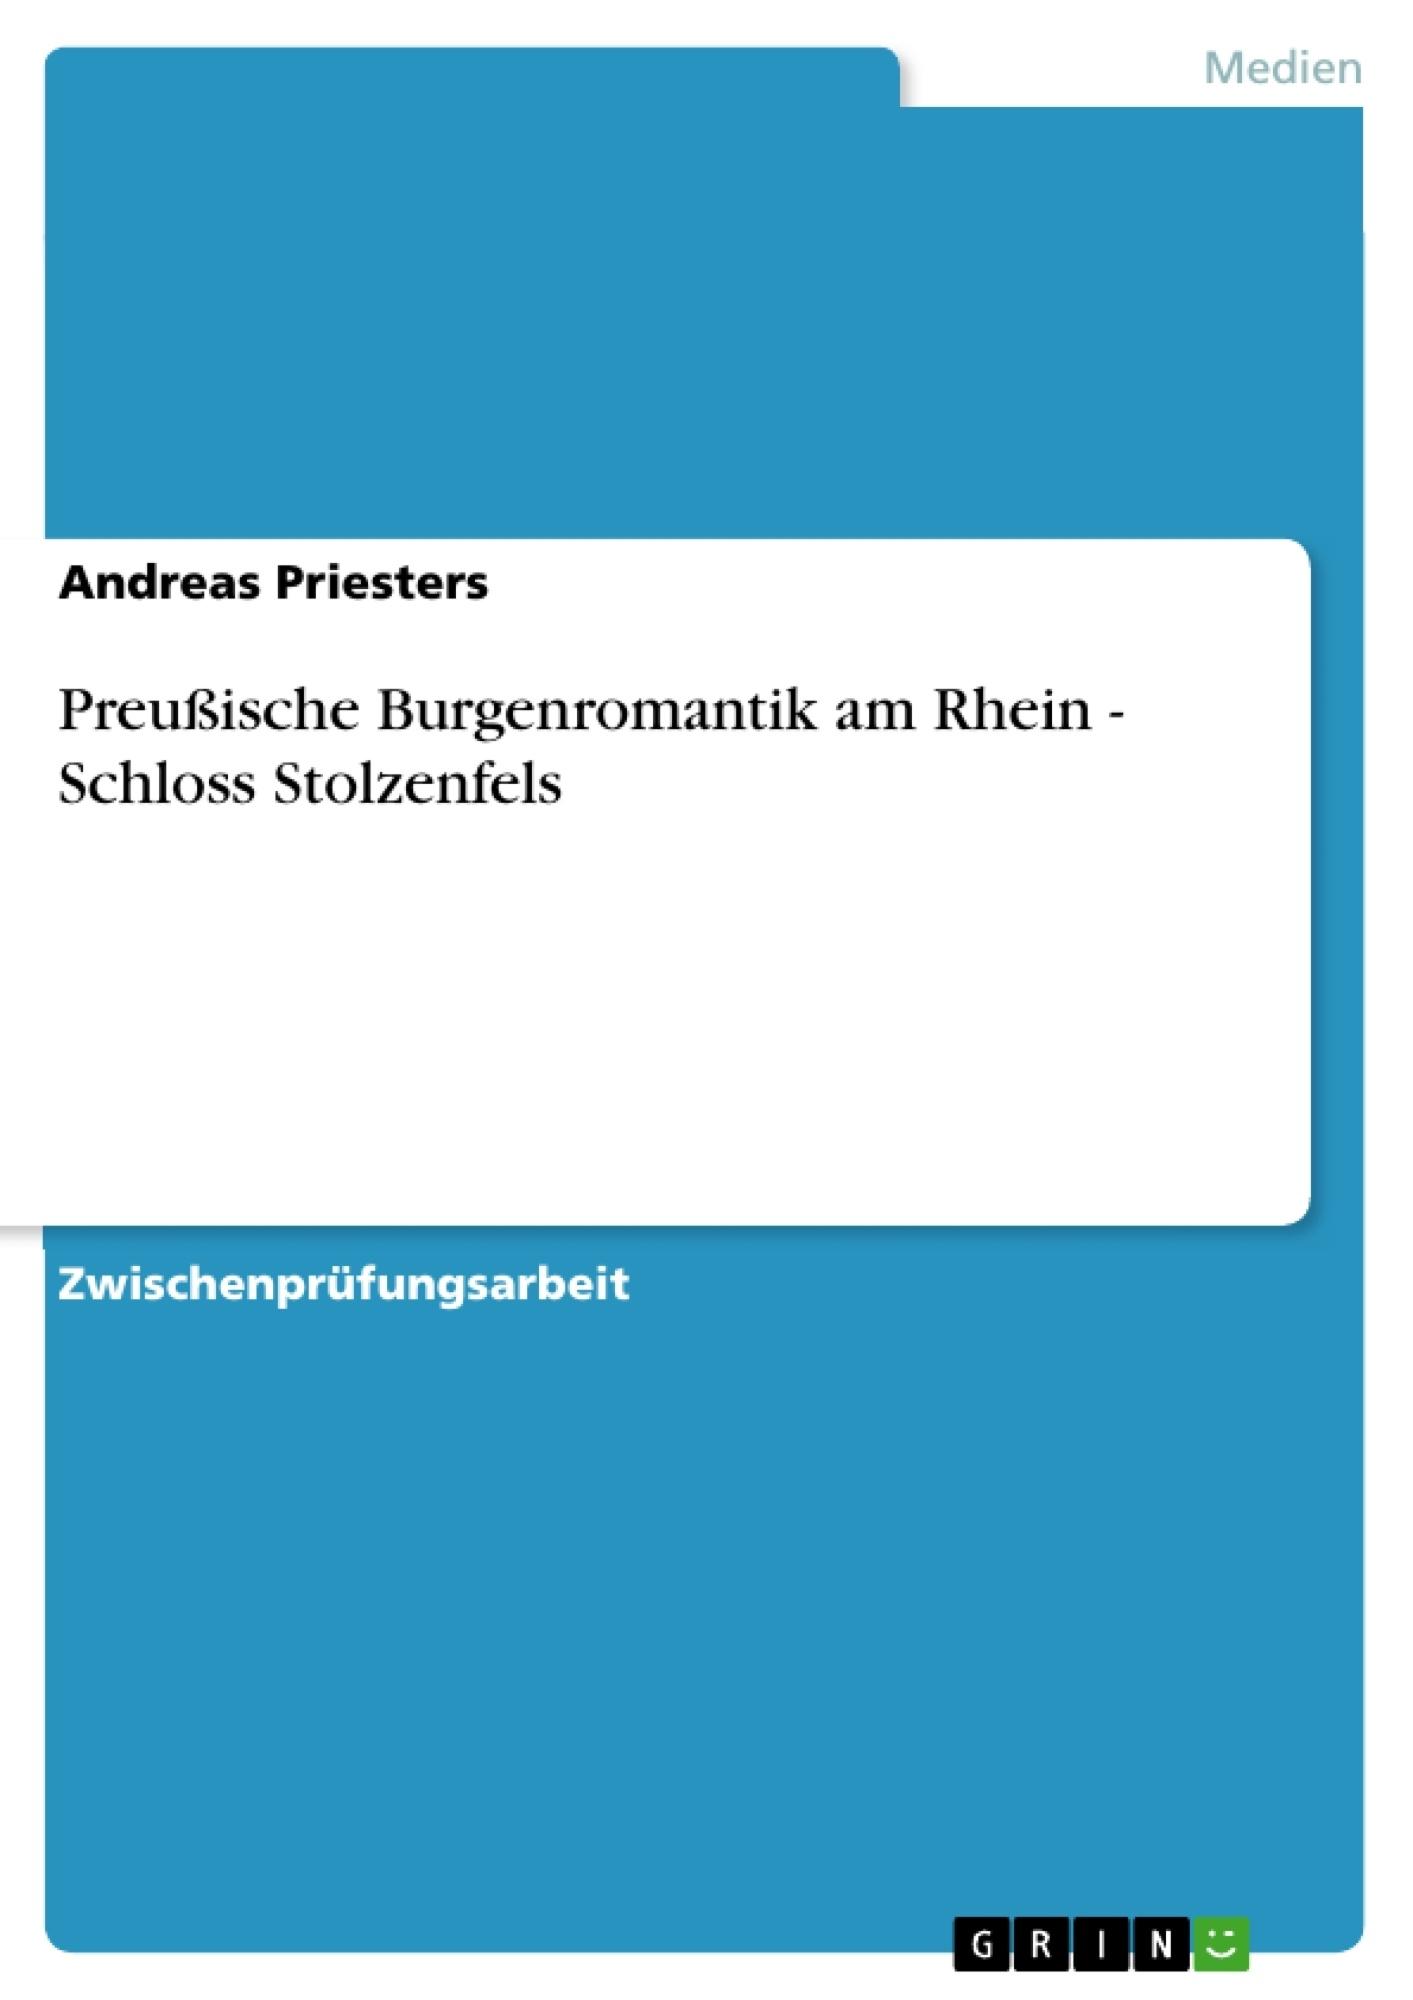 Titel: Preußische Burgenromantik am Rhein - Schloss Stolzenfels